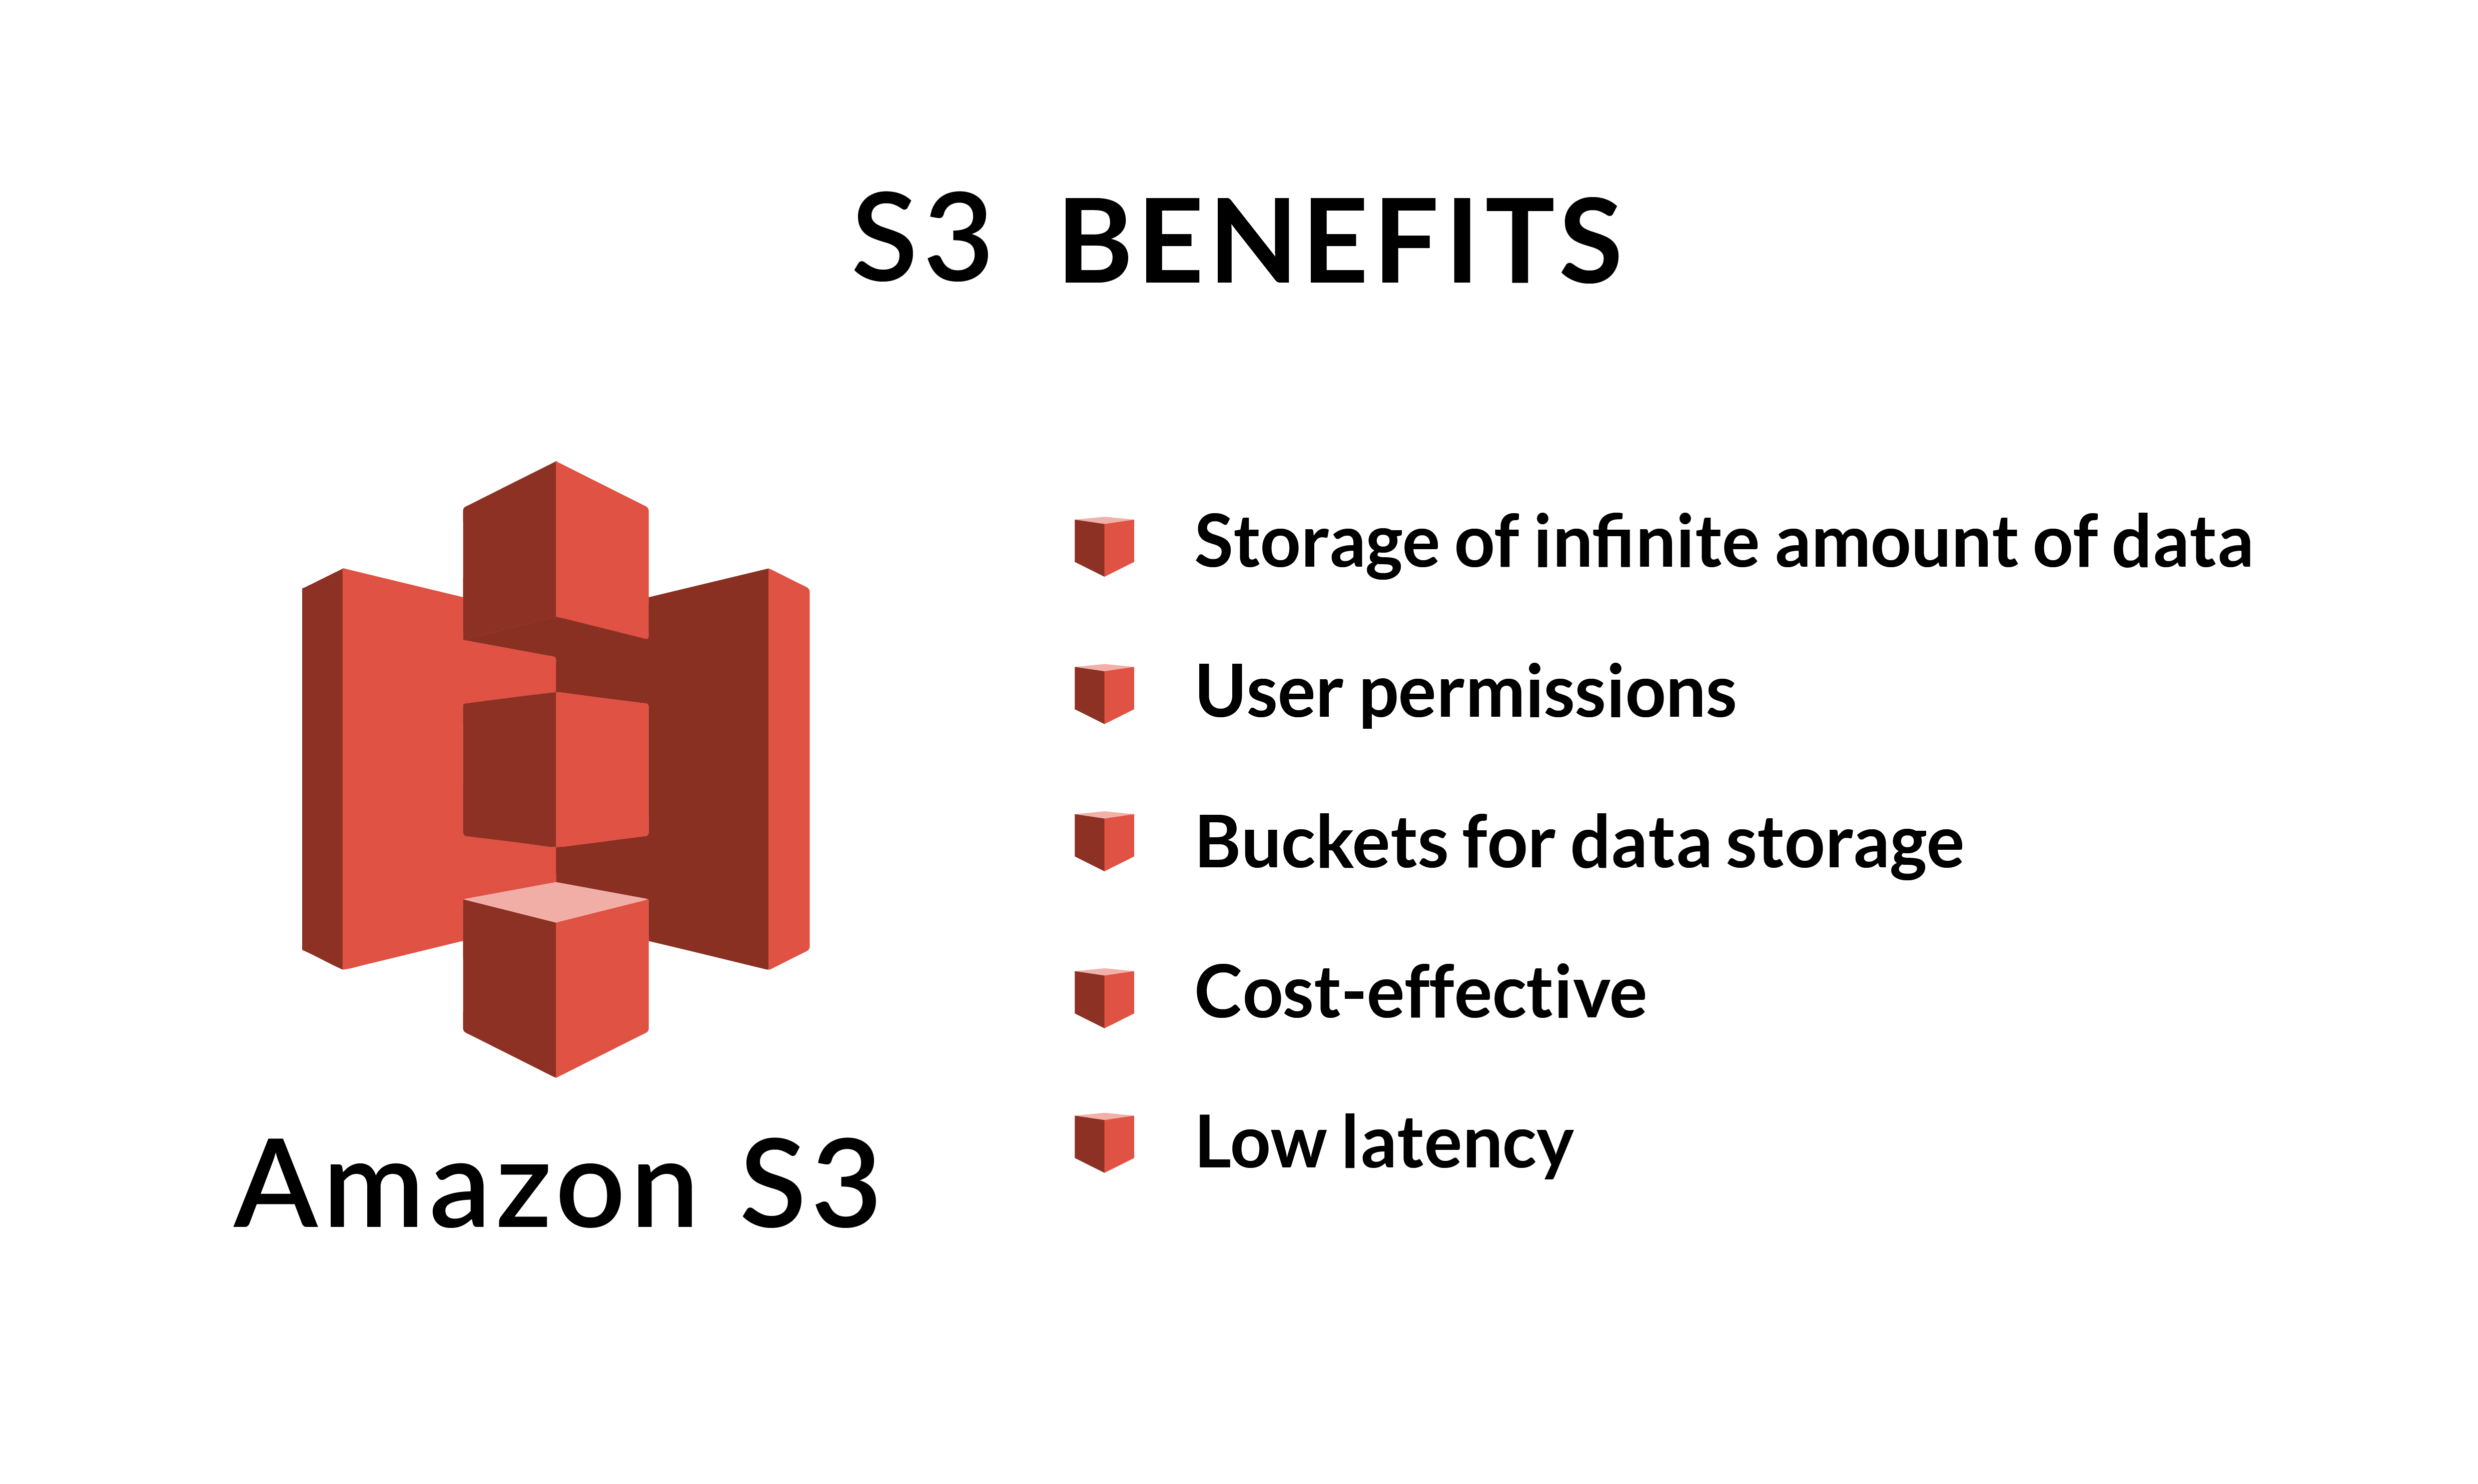 S3 benefits